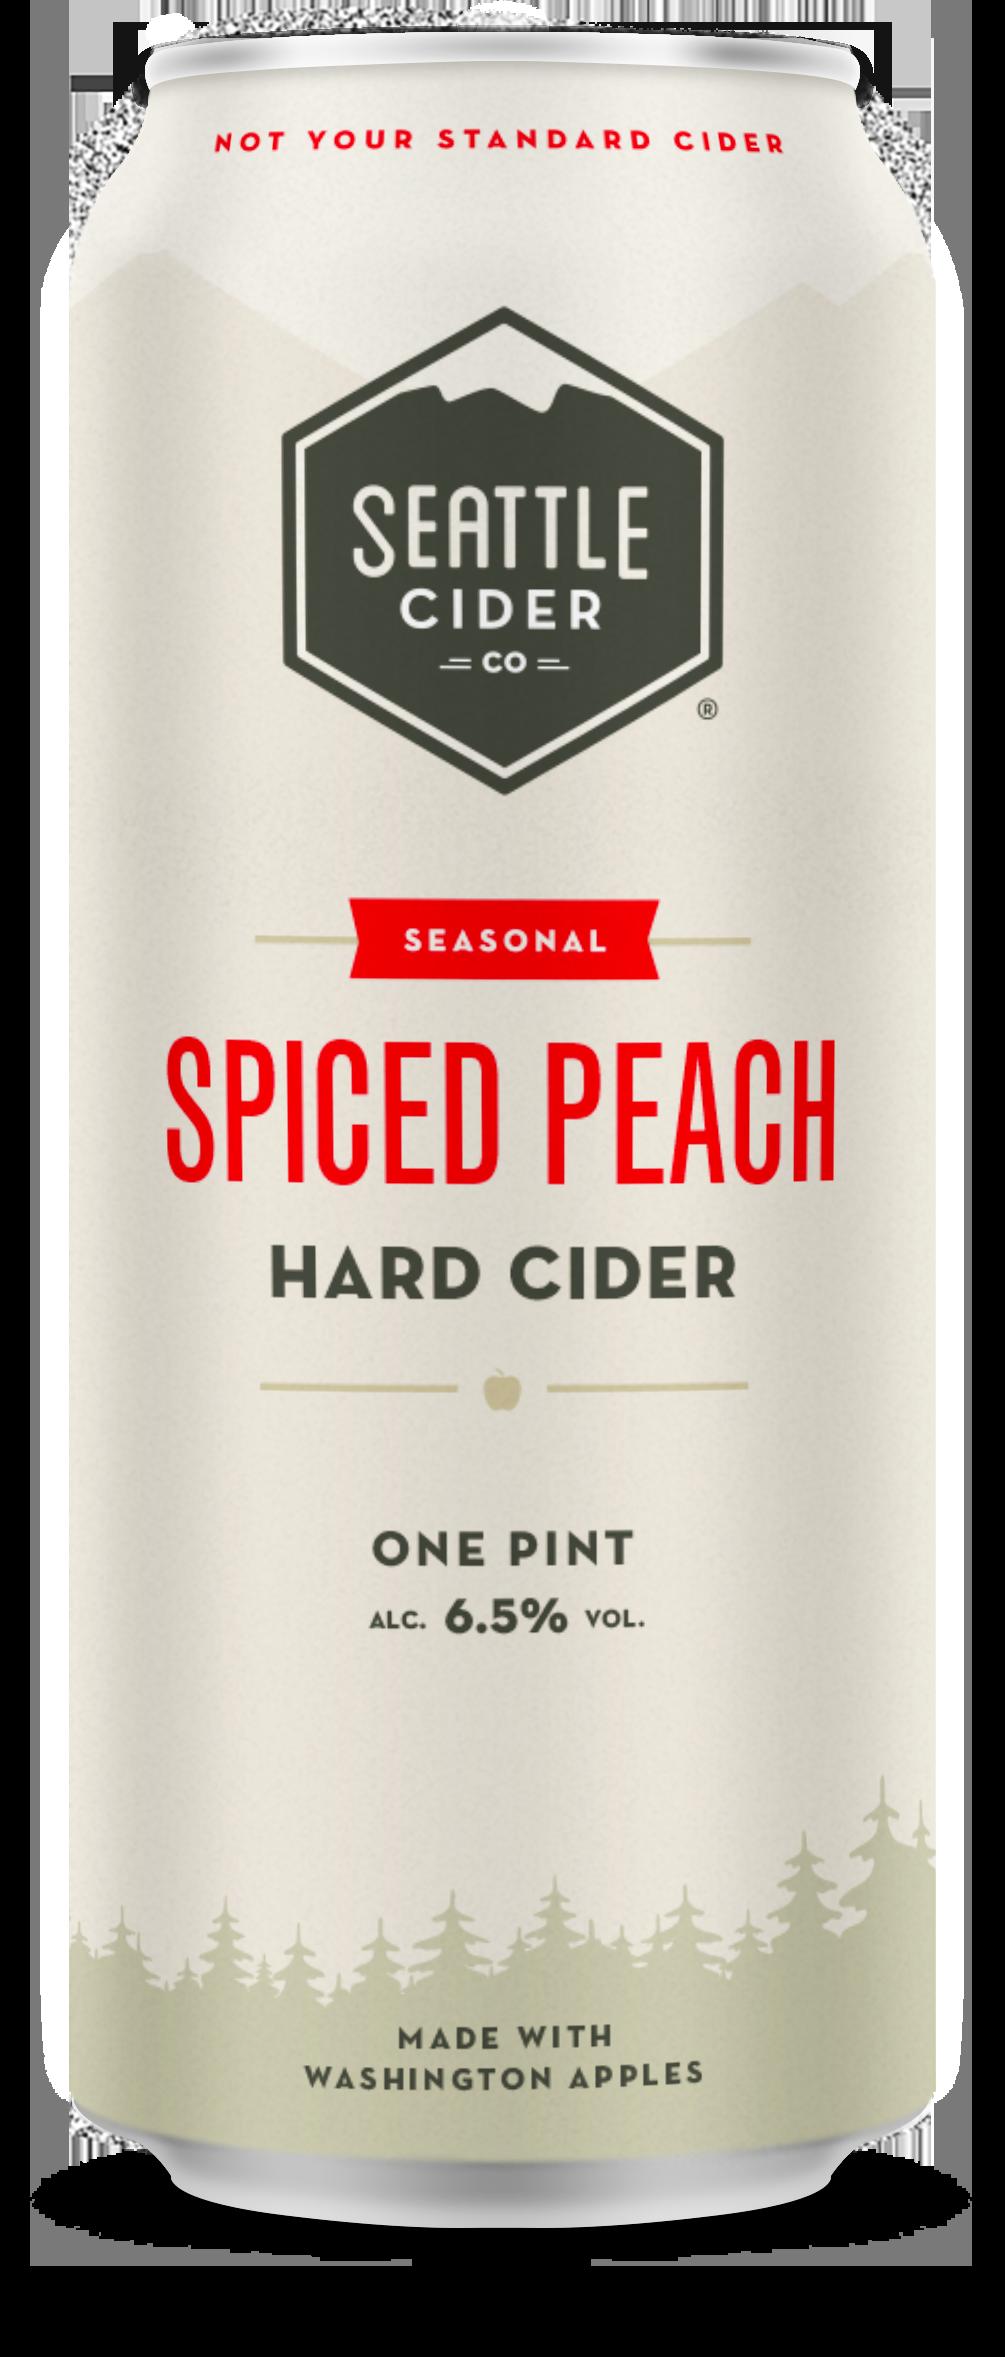 Spiced Peach